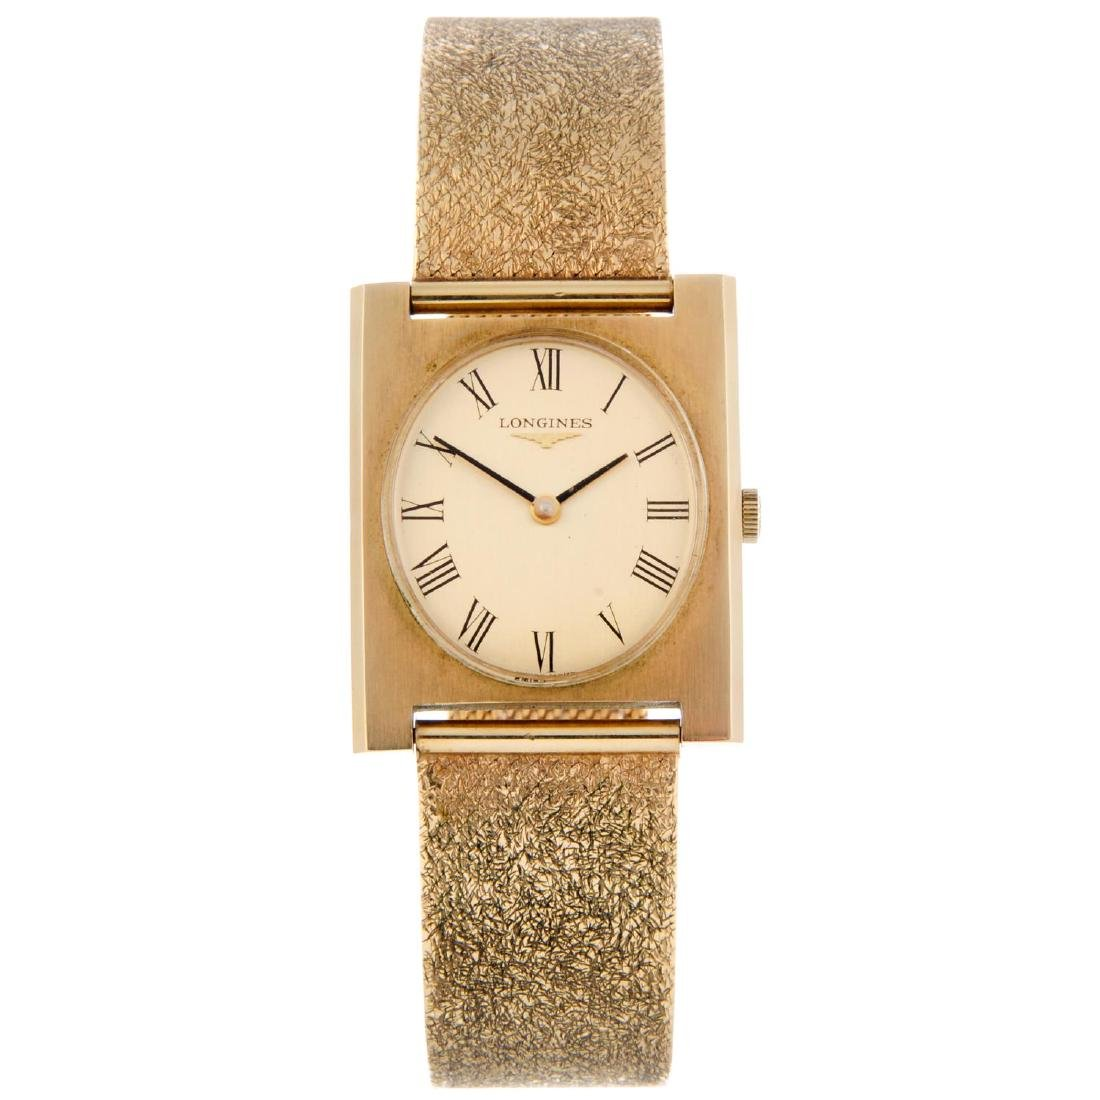 LONGINES - a gentleman's bracelet watch. 9ct yellow